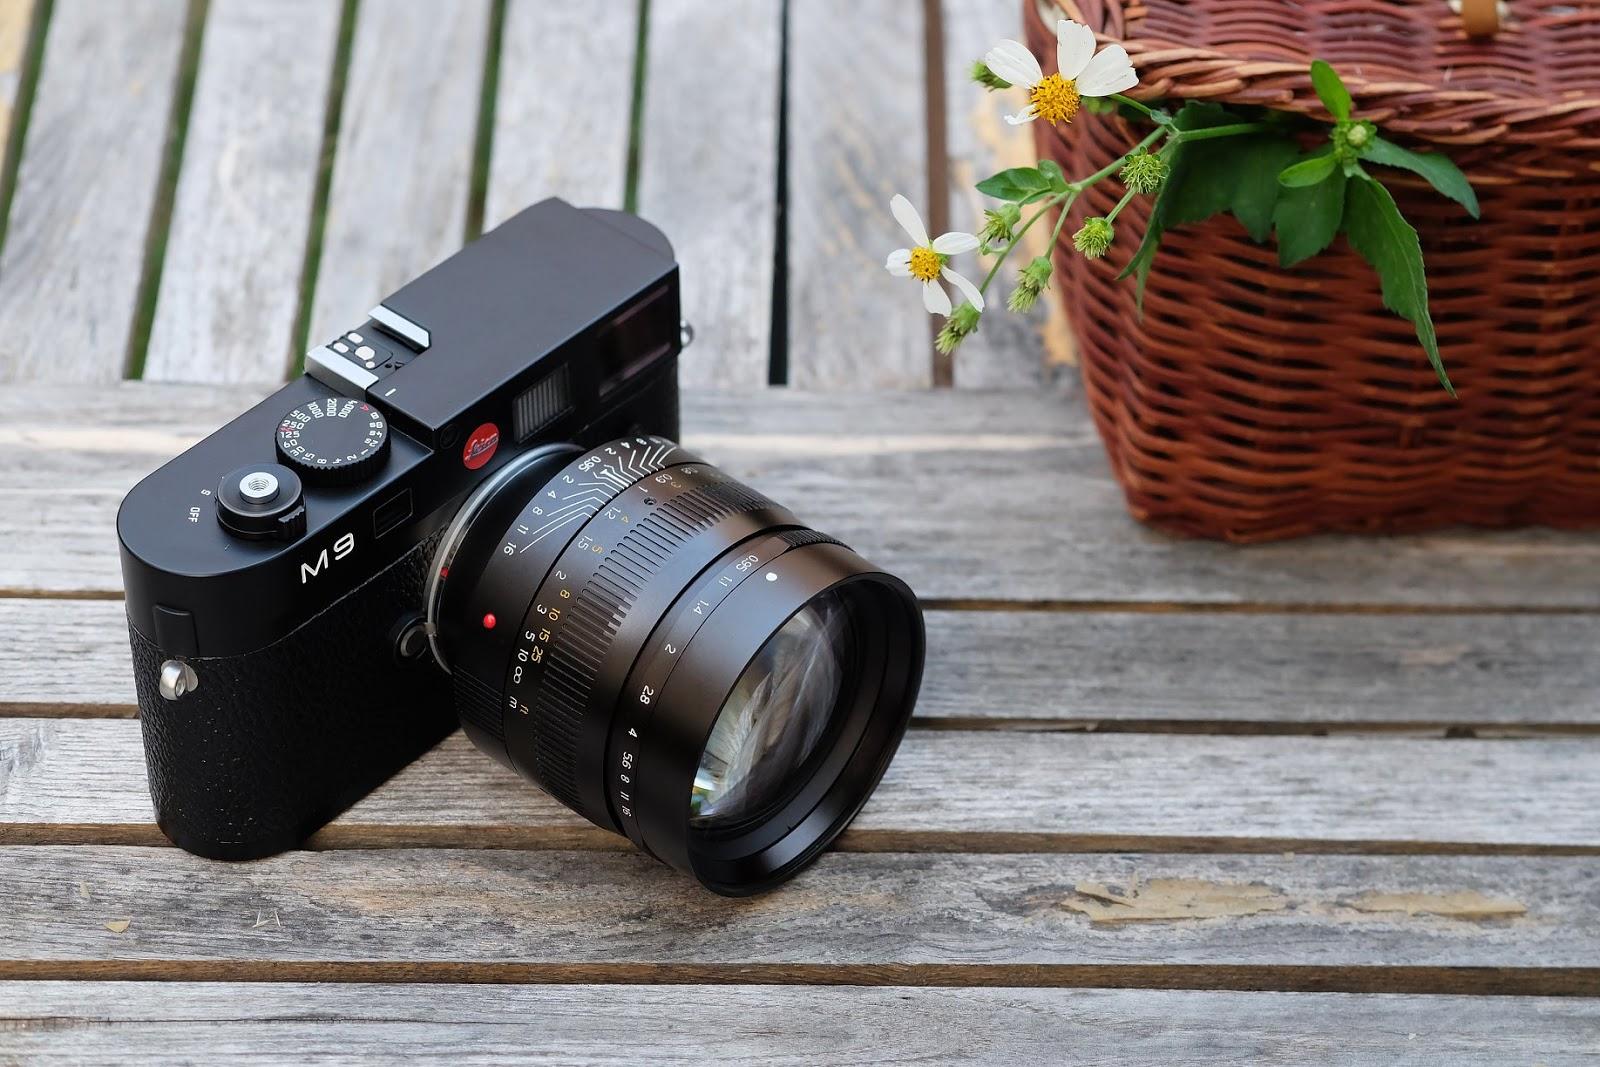 Объектив TTArtisan 50mm f/0.95 с камерой Leica M9